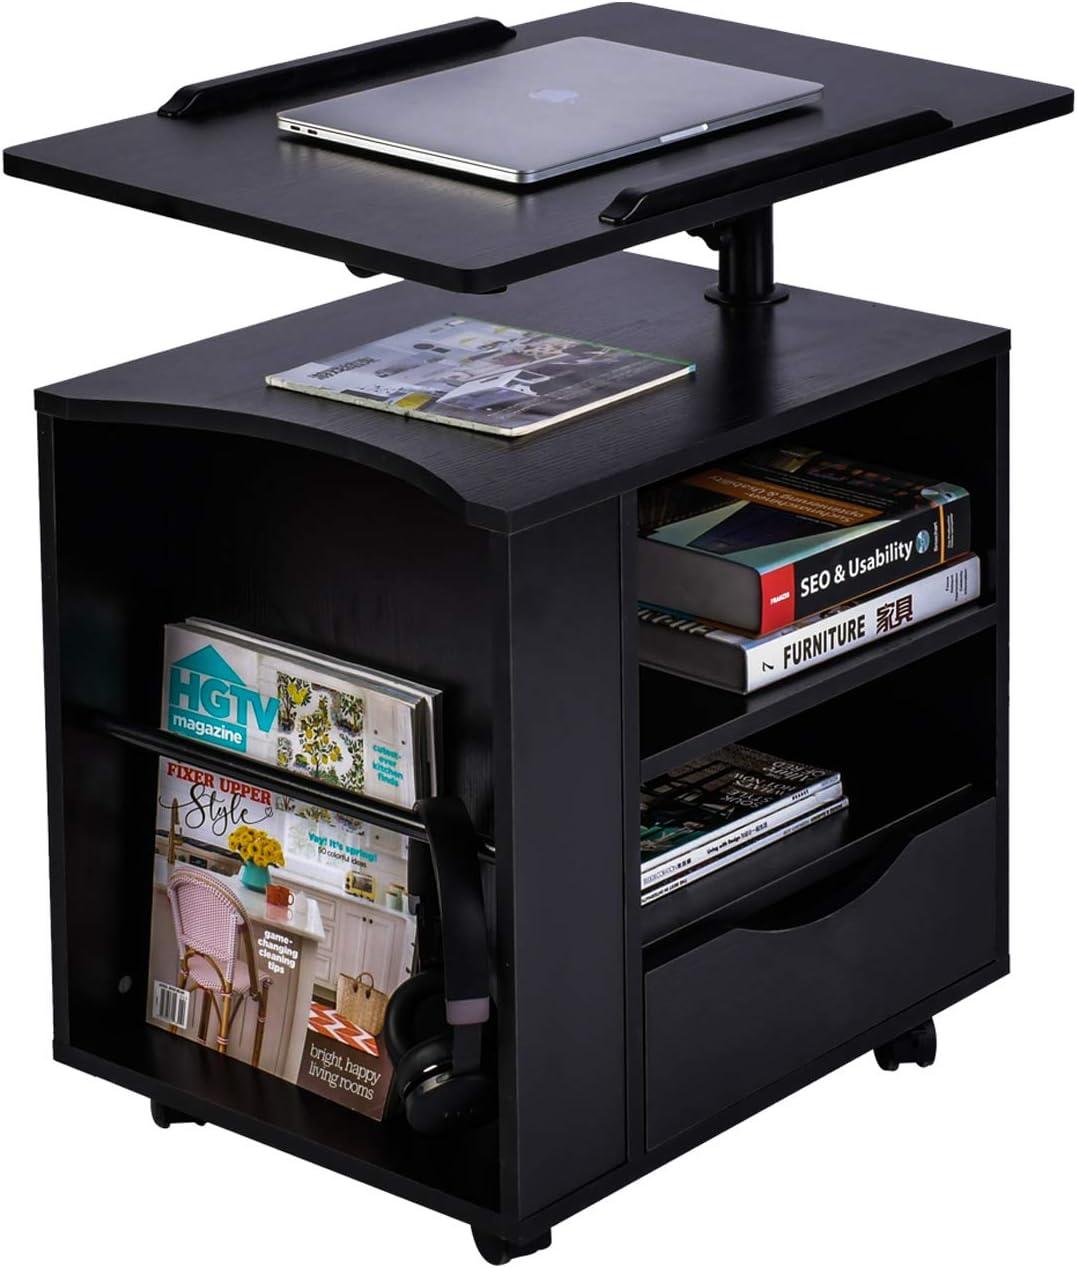 AIZ Bedside Desk for Laptop, Adjustable Bed Desk Overbed Table Rolling Nightstand with Storage Drawer, Laptop Desk with Swivel Top,Black (Right Side)